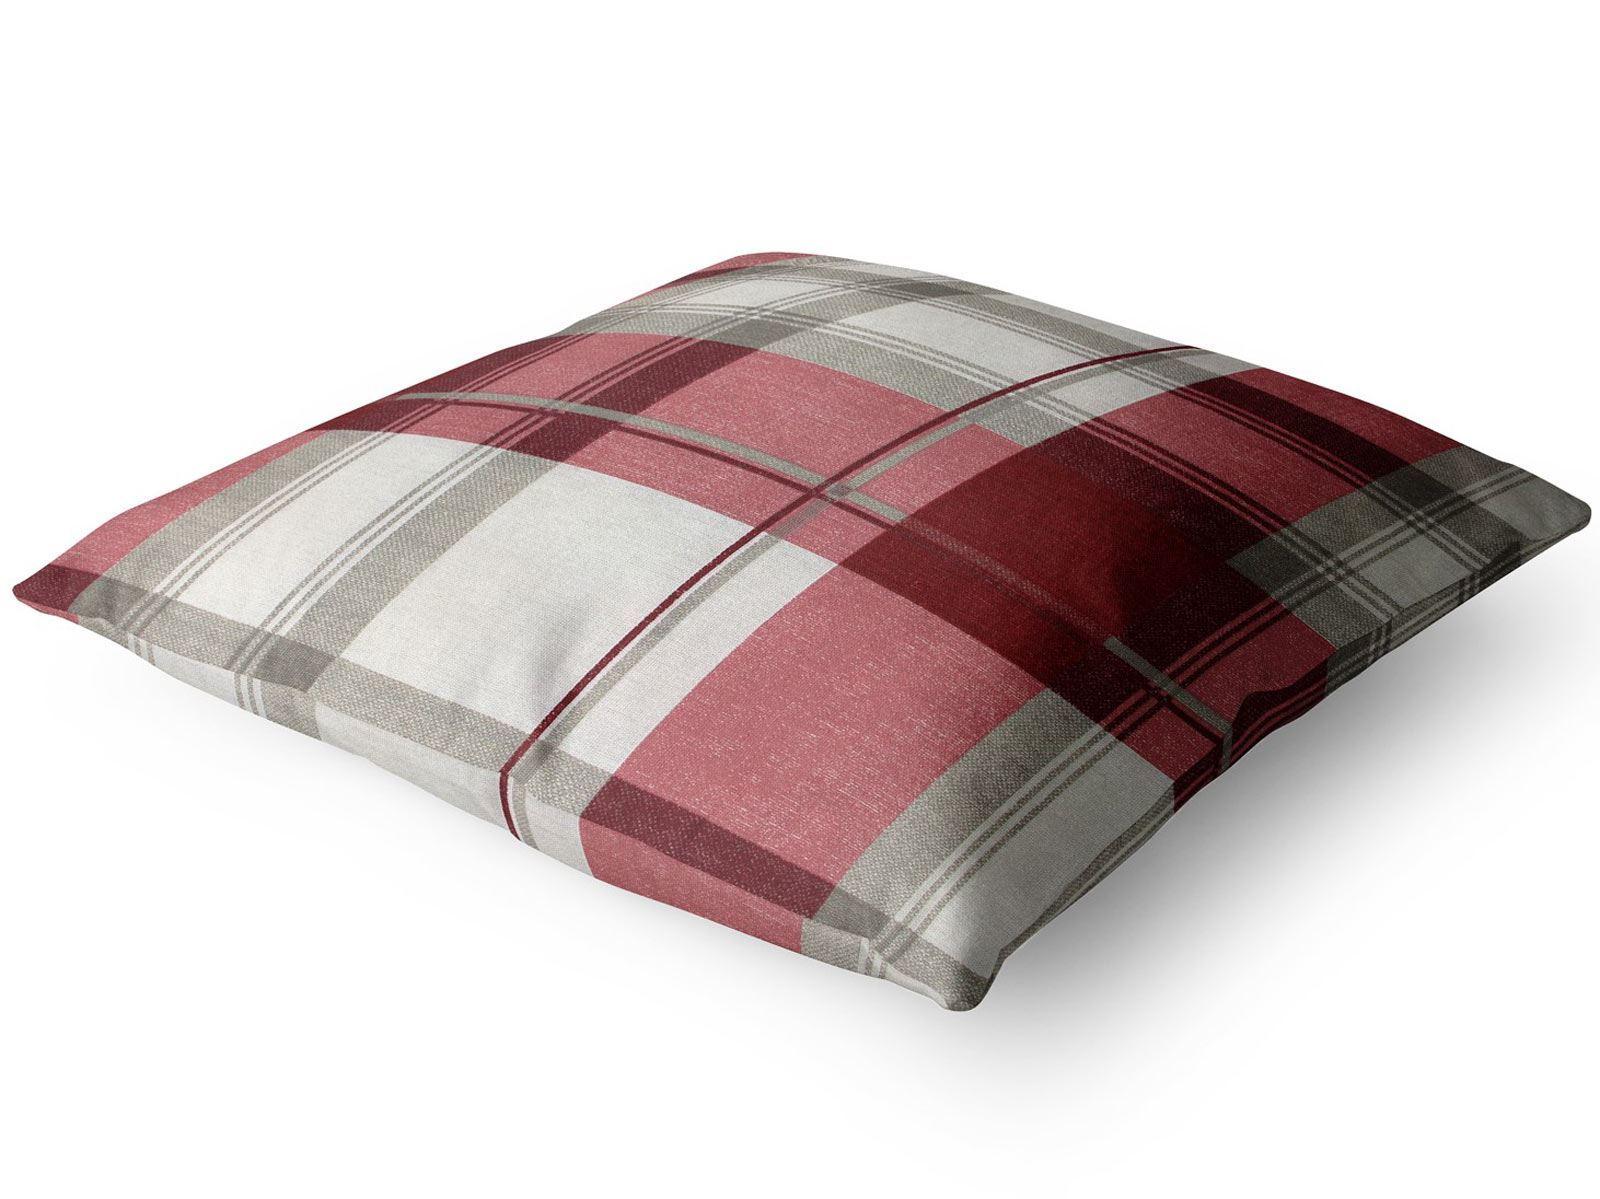 Vino-Tinto-Cushion-Covers-Coleccion-17-034-18-034-43cm-45cm-Cubierta miniatura 38